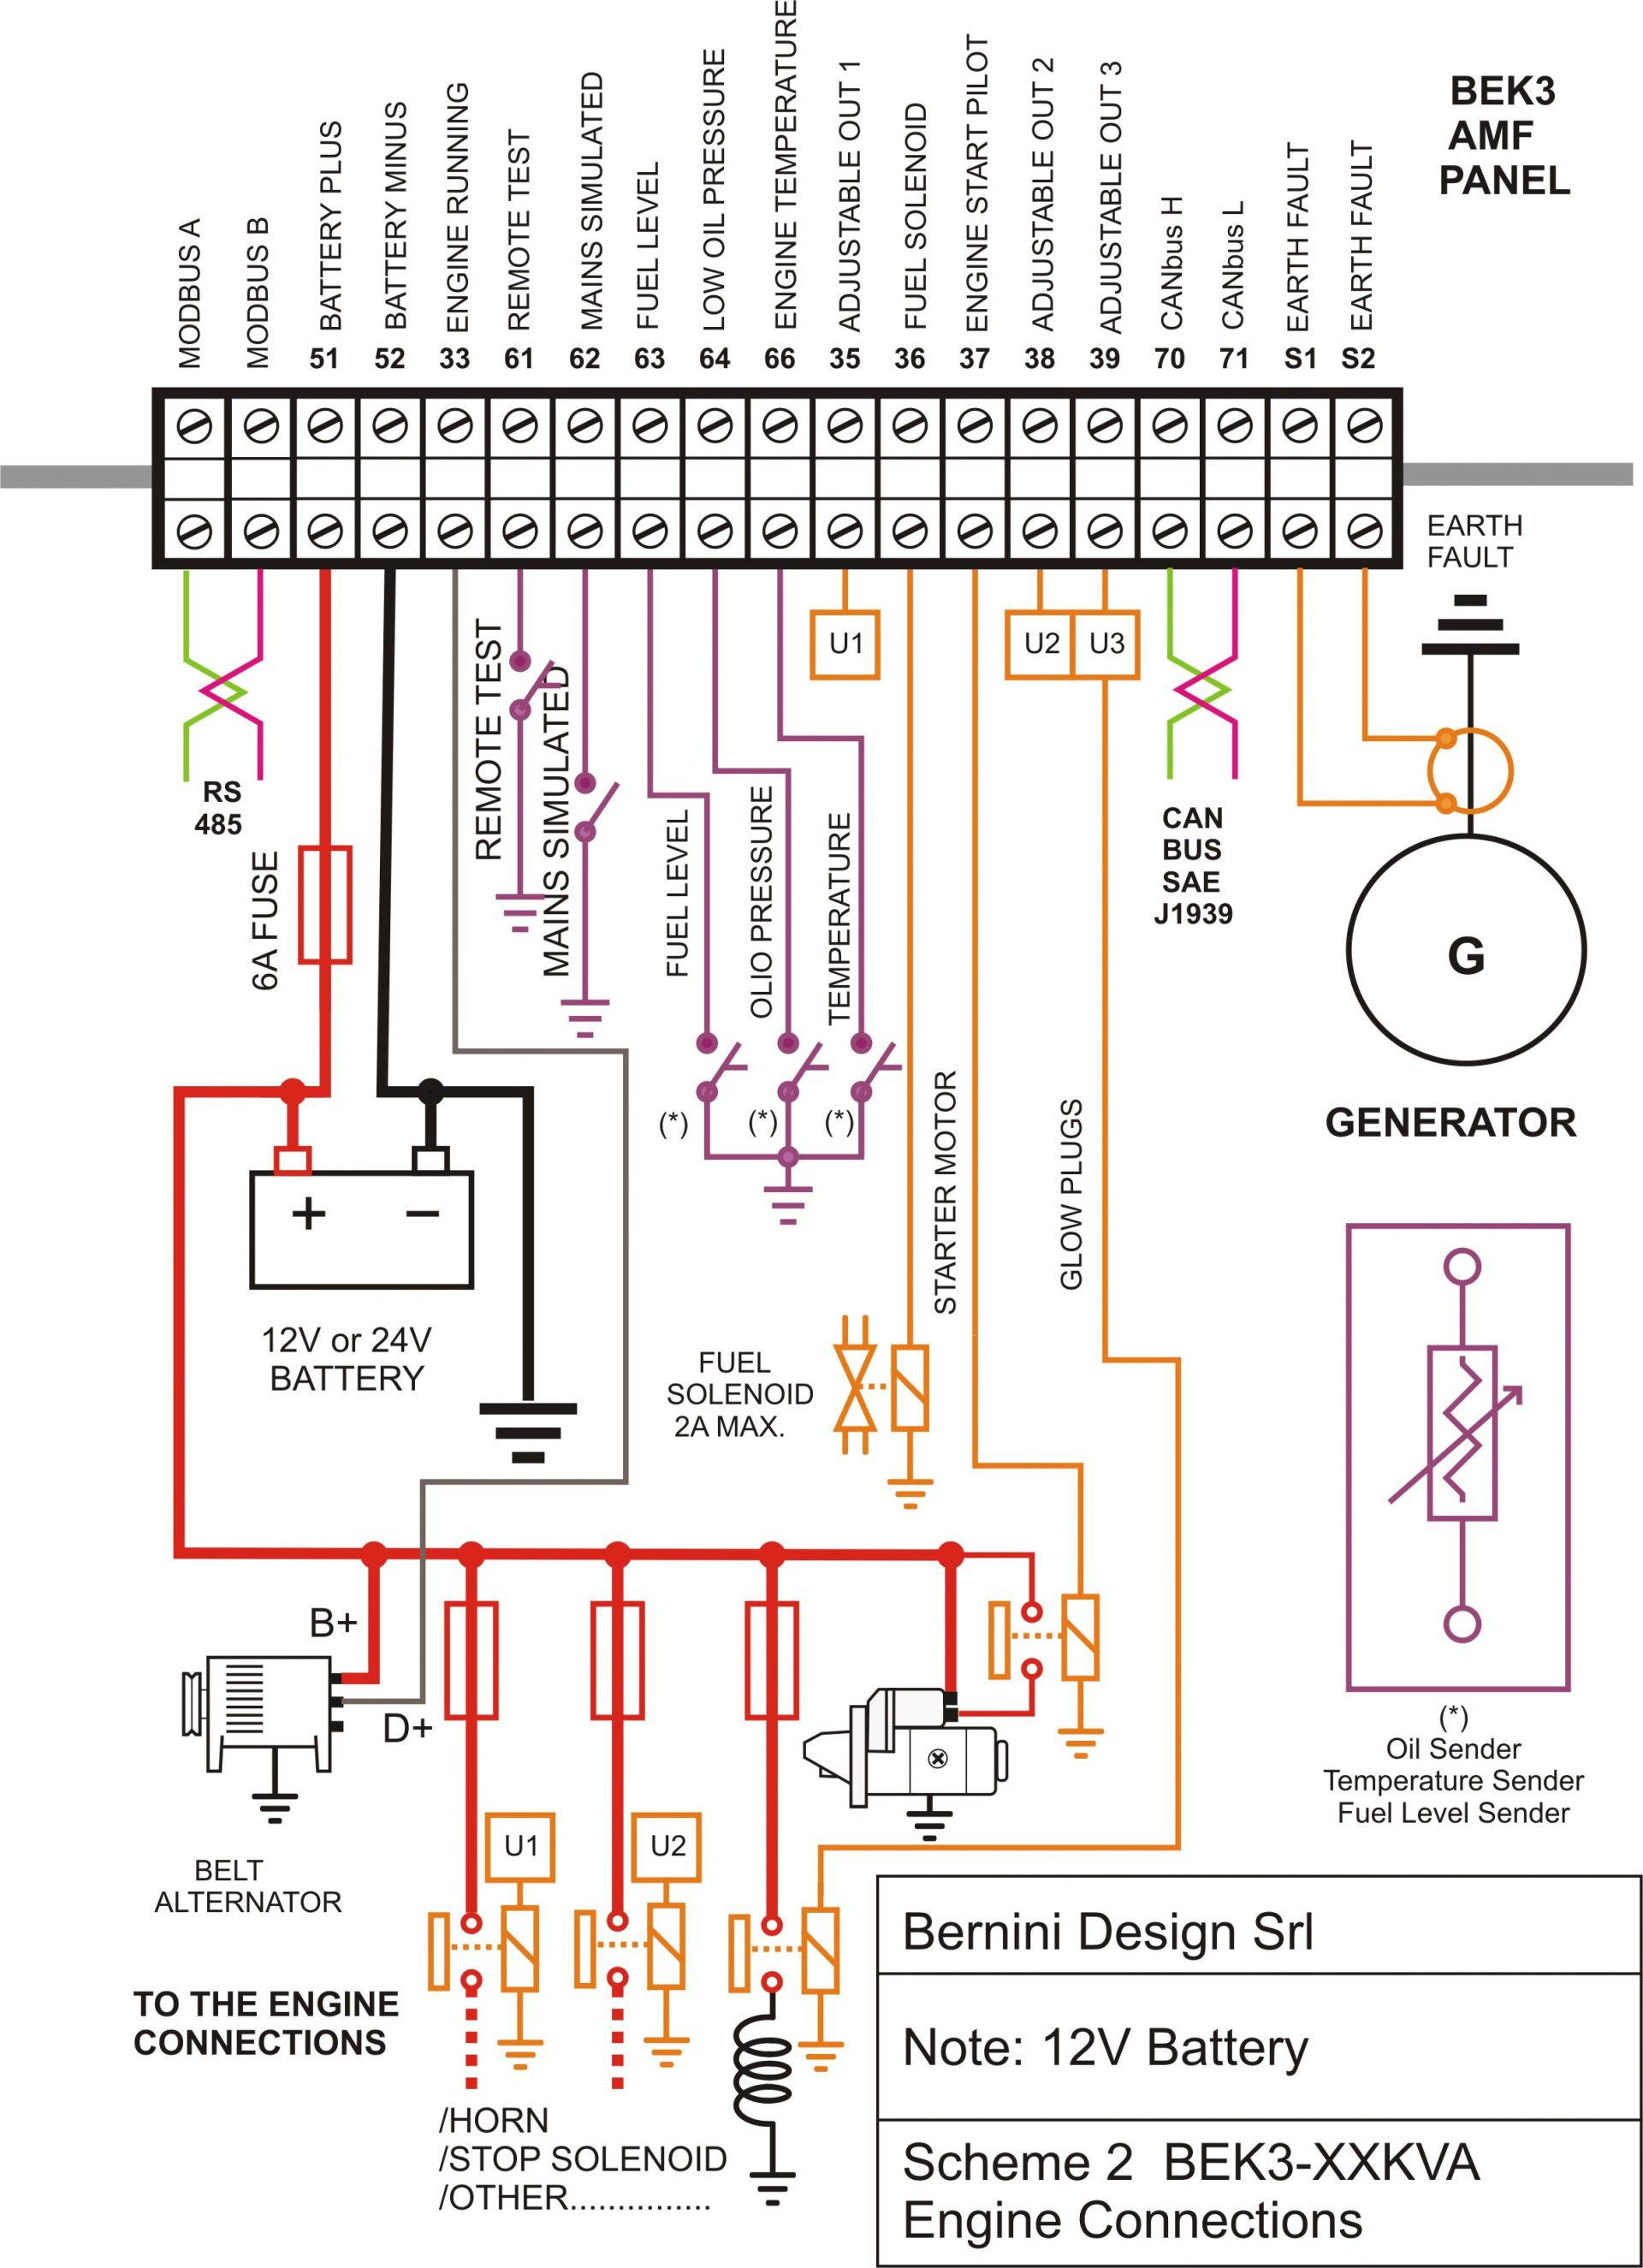 c15 cat ecm pin wiring diagram free download az 8744  cummins isx ecm wiring diagram likewise cummins ecm  cummins isx ecm wiring diagram likewise